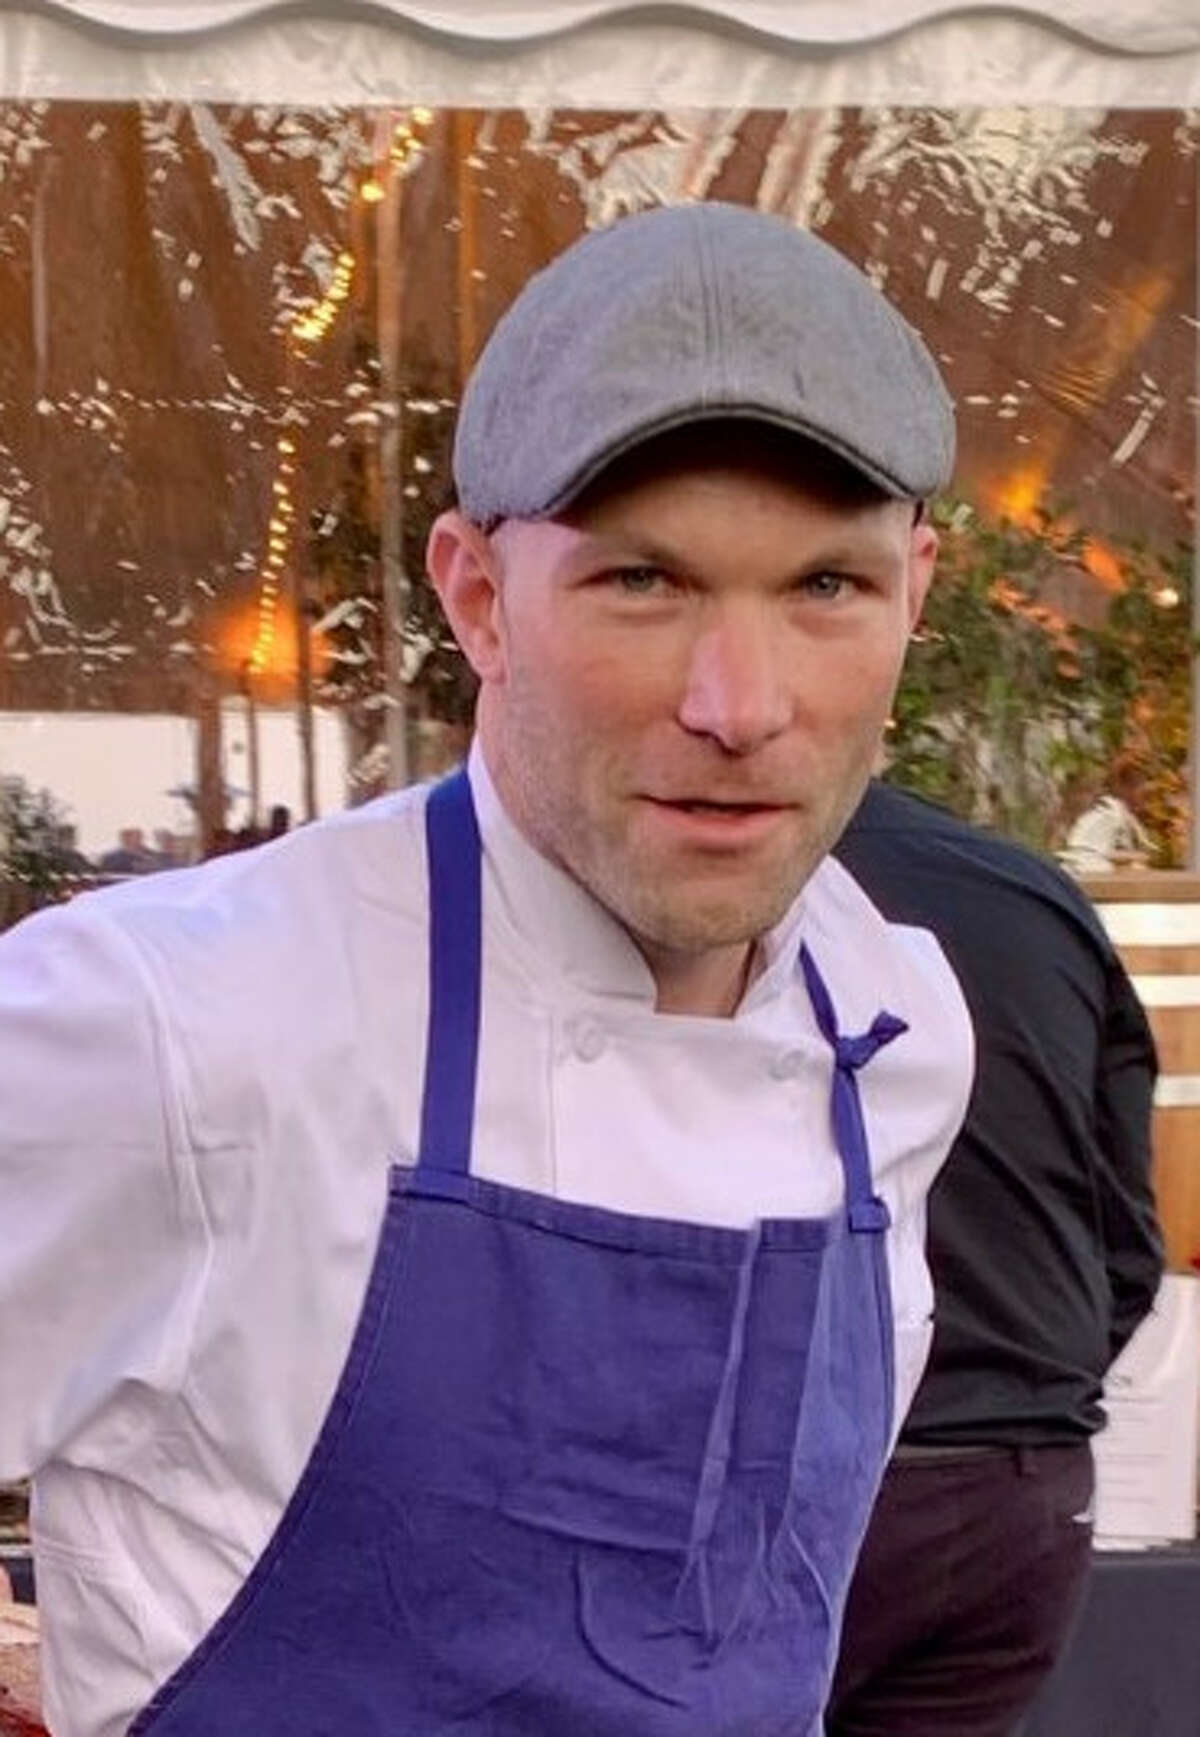 Chef Michael Blake. (Photo courtesy John Sconzo.)